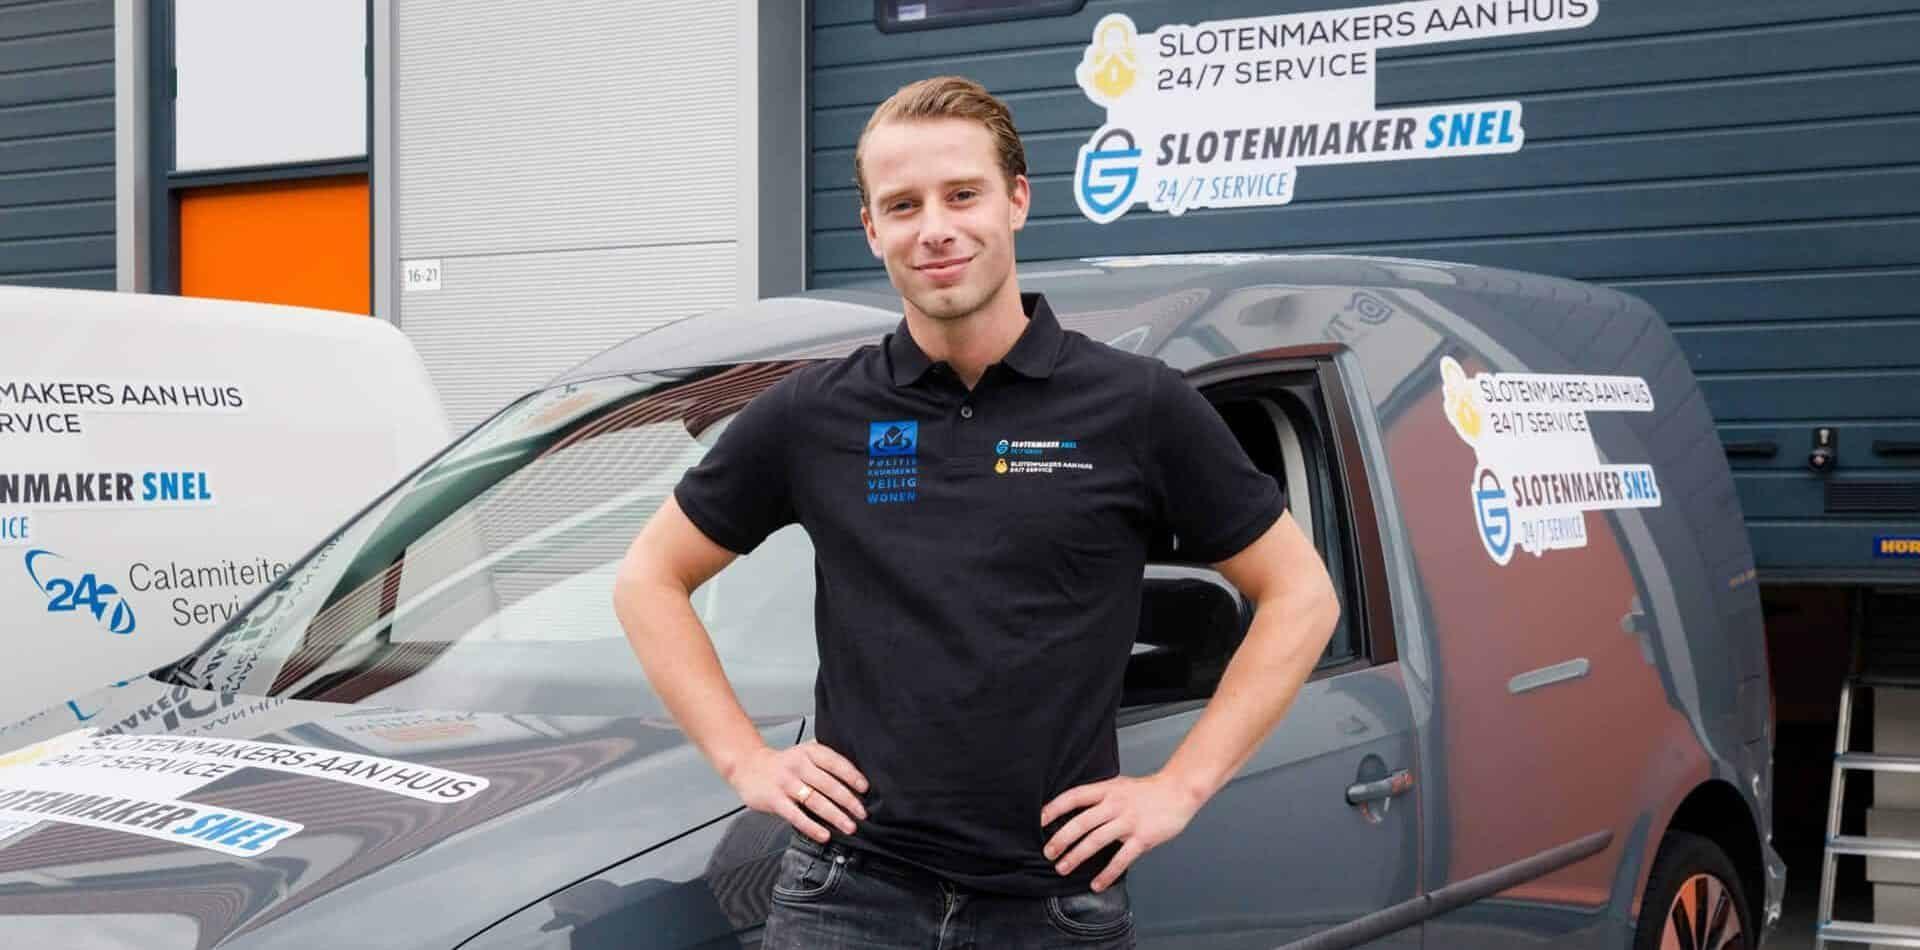 Slotenmaker Eindhoven (6)